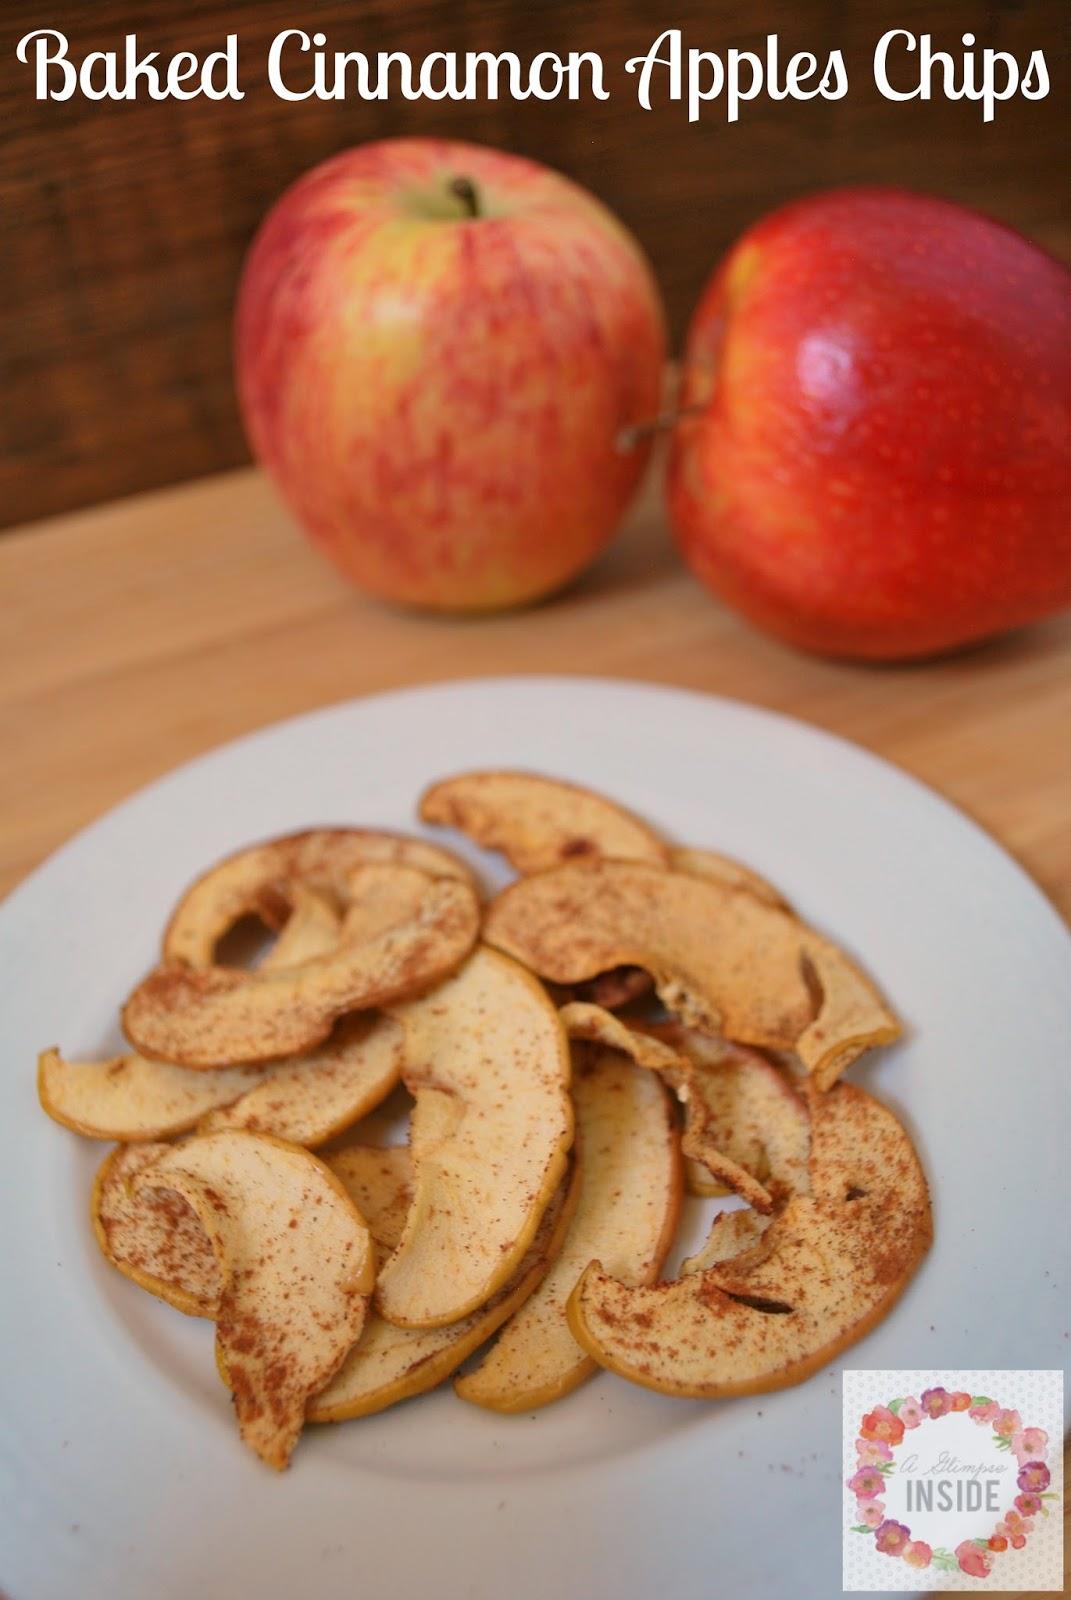 http://www.aglimpseinsideblog.com/2016/06/baked-cinnamon-apple-chips.html